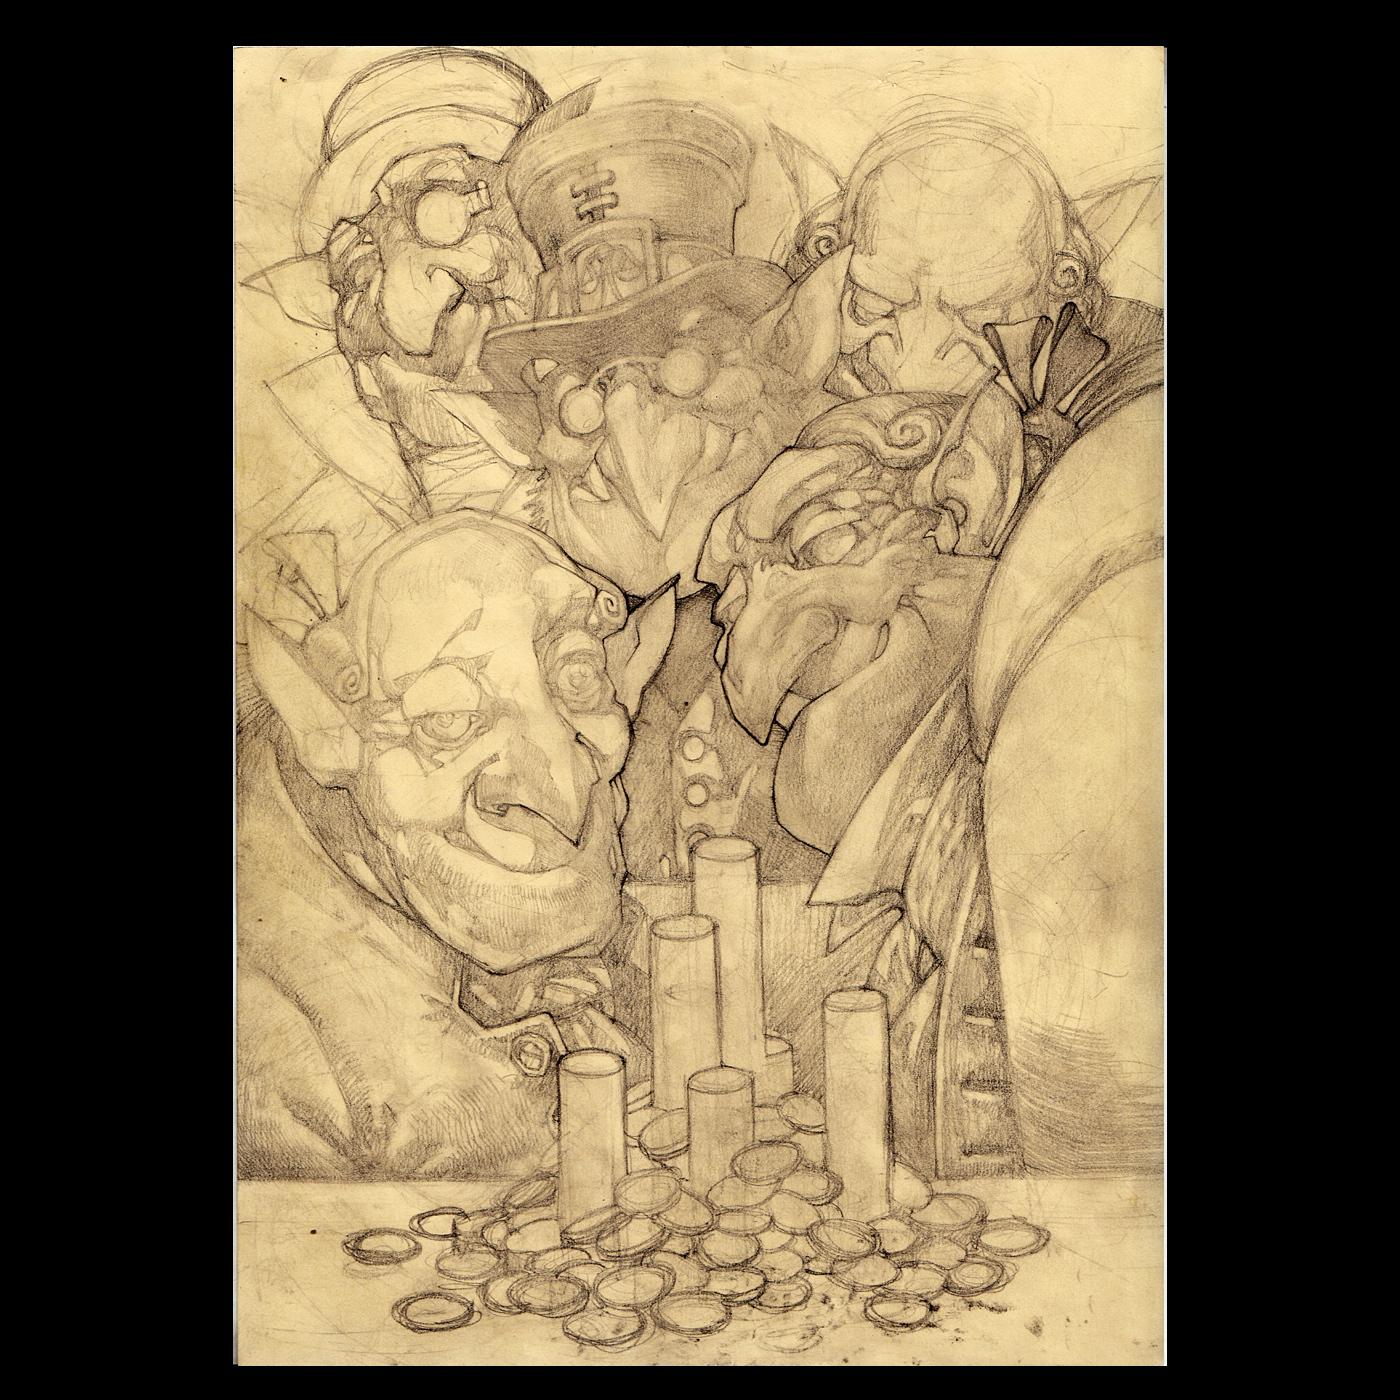 Gremlins Concept Art